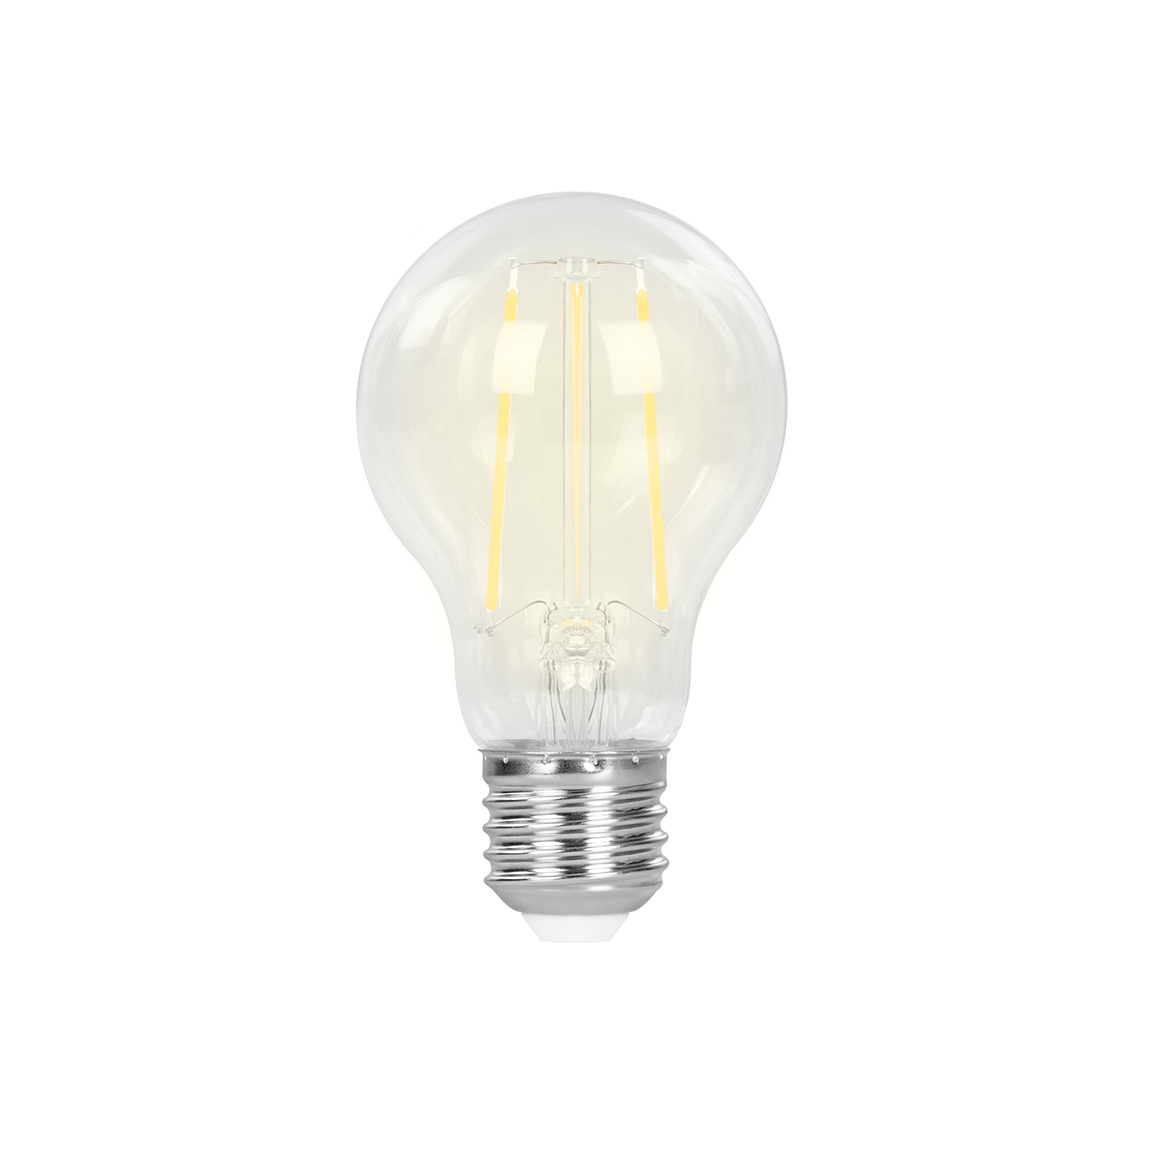 Hombli Smart Bulb E27 Filament